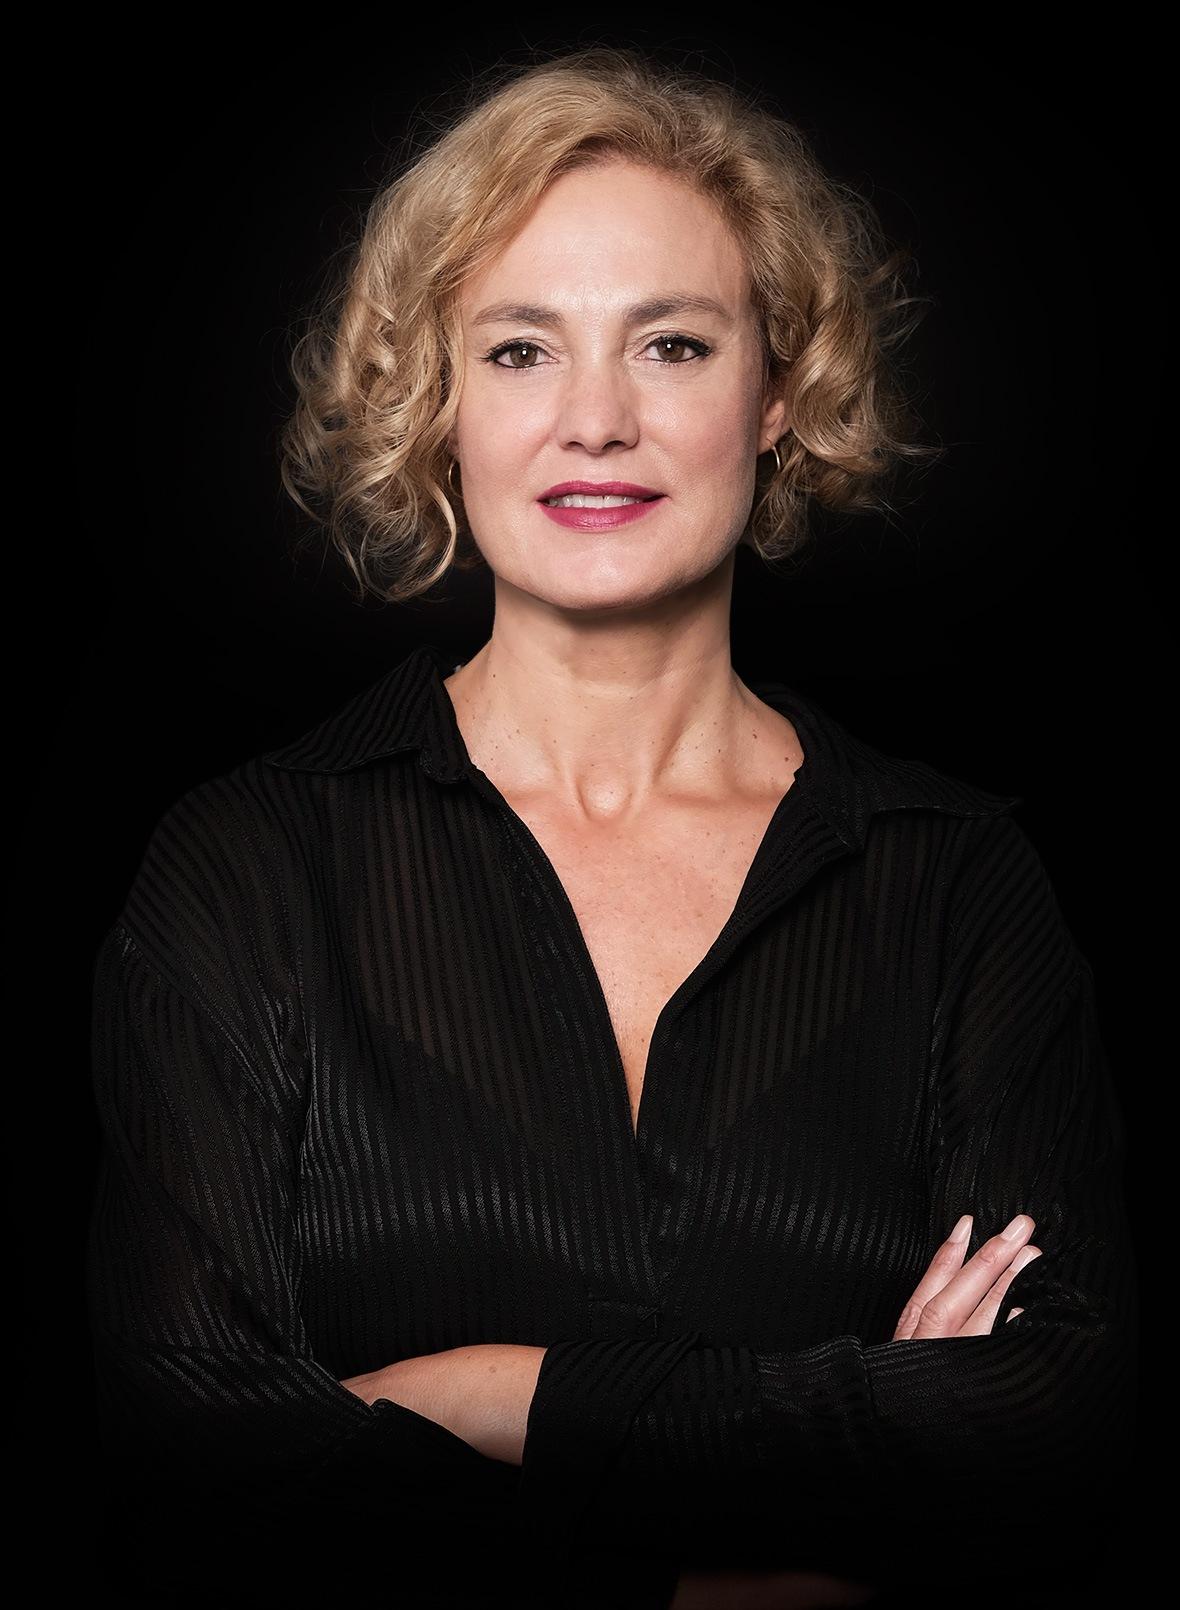 Artemis Uriz